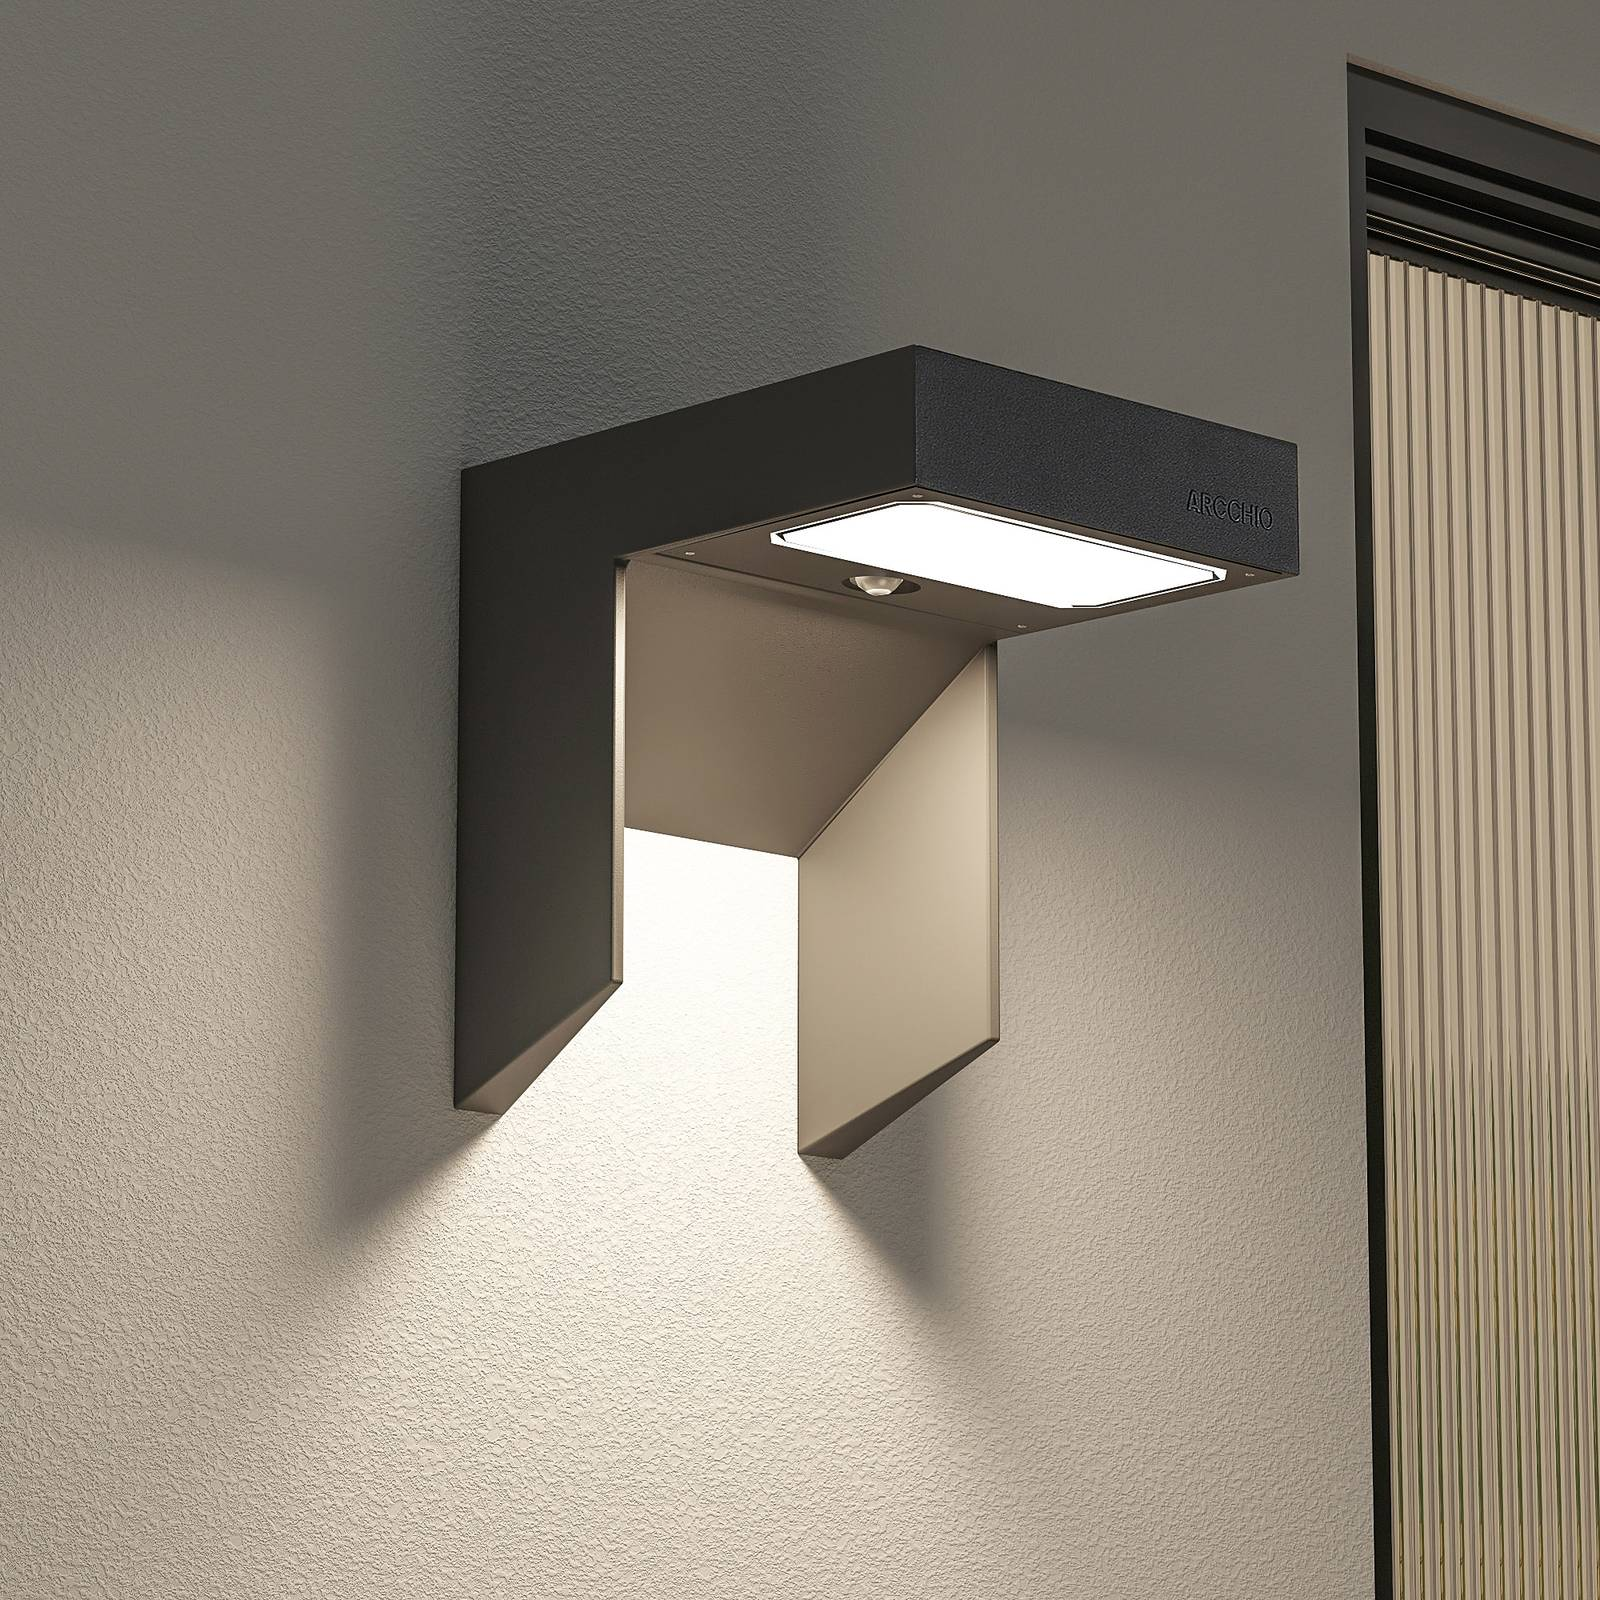 Arcchio Dynorma -LED-ulkoseinälamppu anturilla